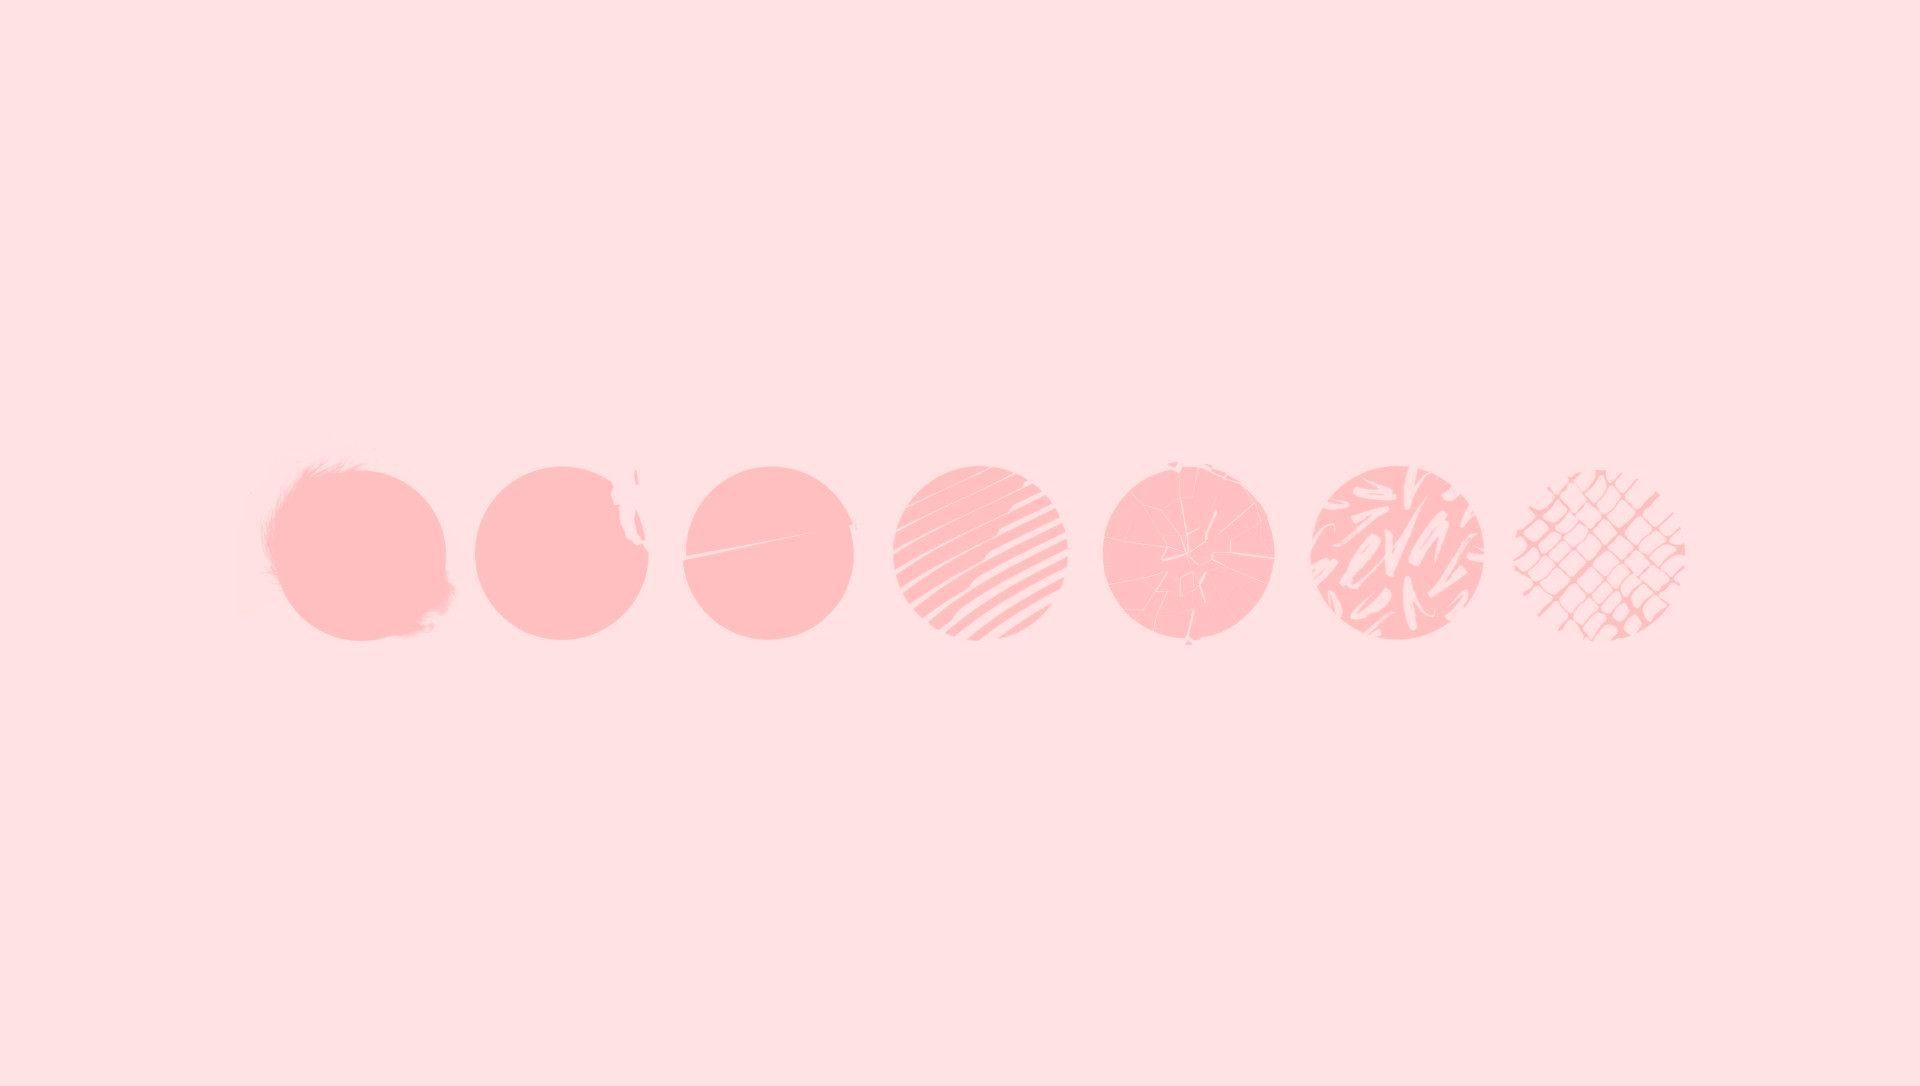 Pink Computer Wallpaper Gallery Pastel Pink Aesthetic Aesthetic Desktop Wallpaper Pink Aesthetic